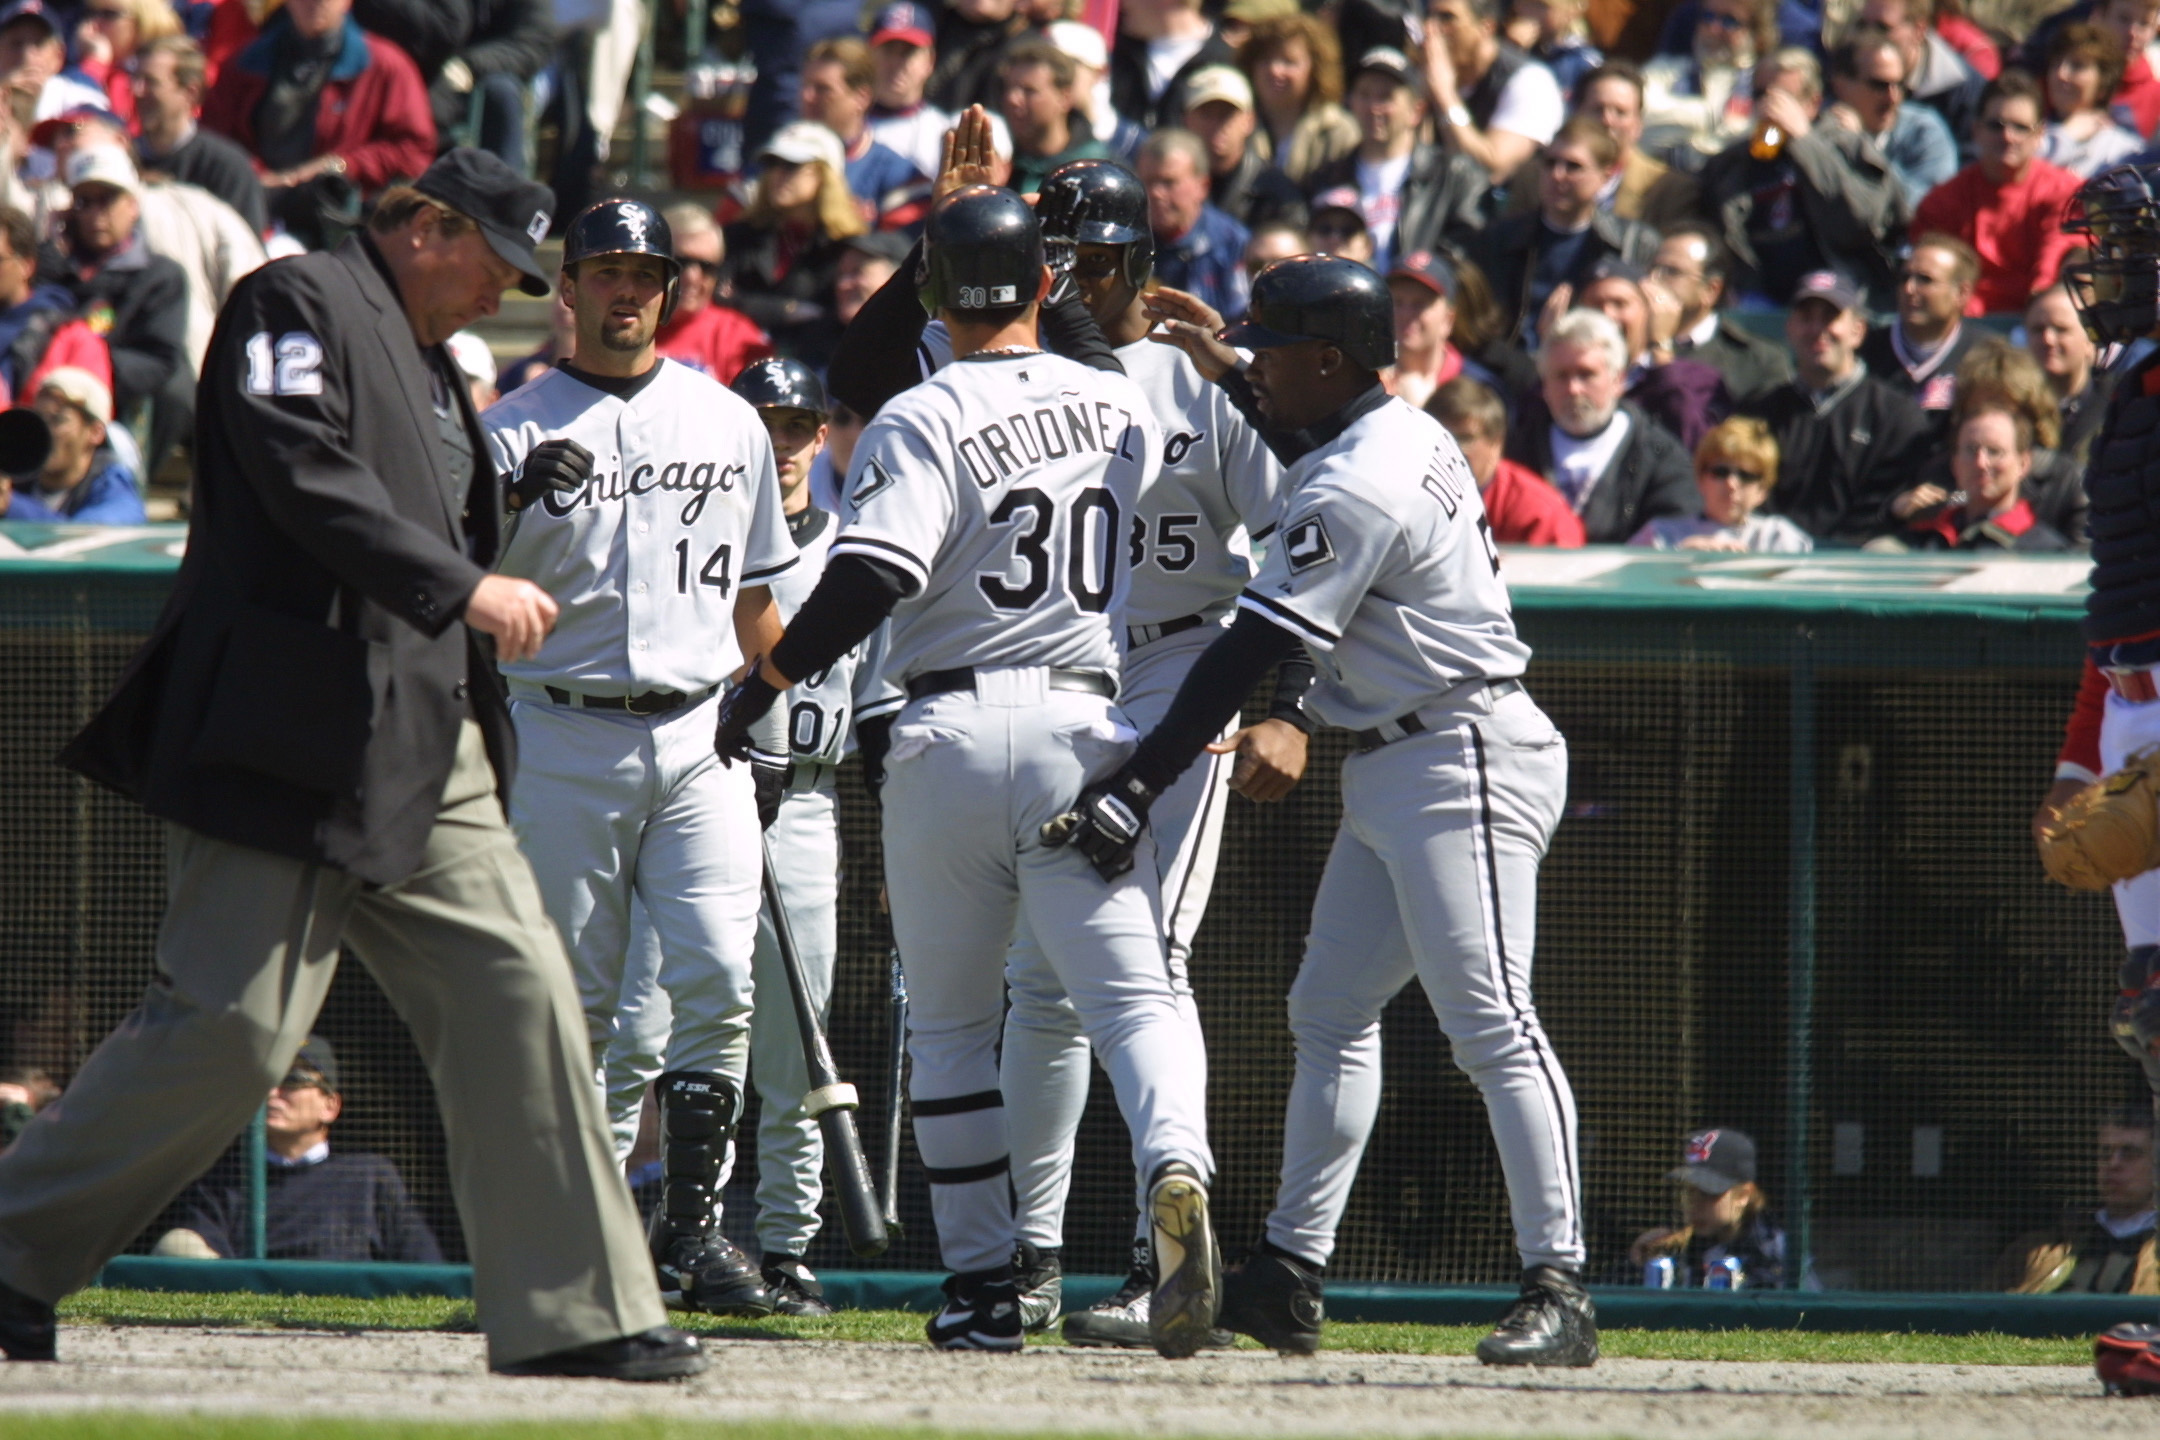 Indians v White Sox X Ordonez